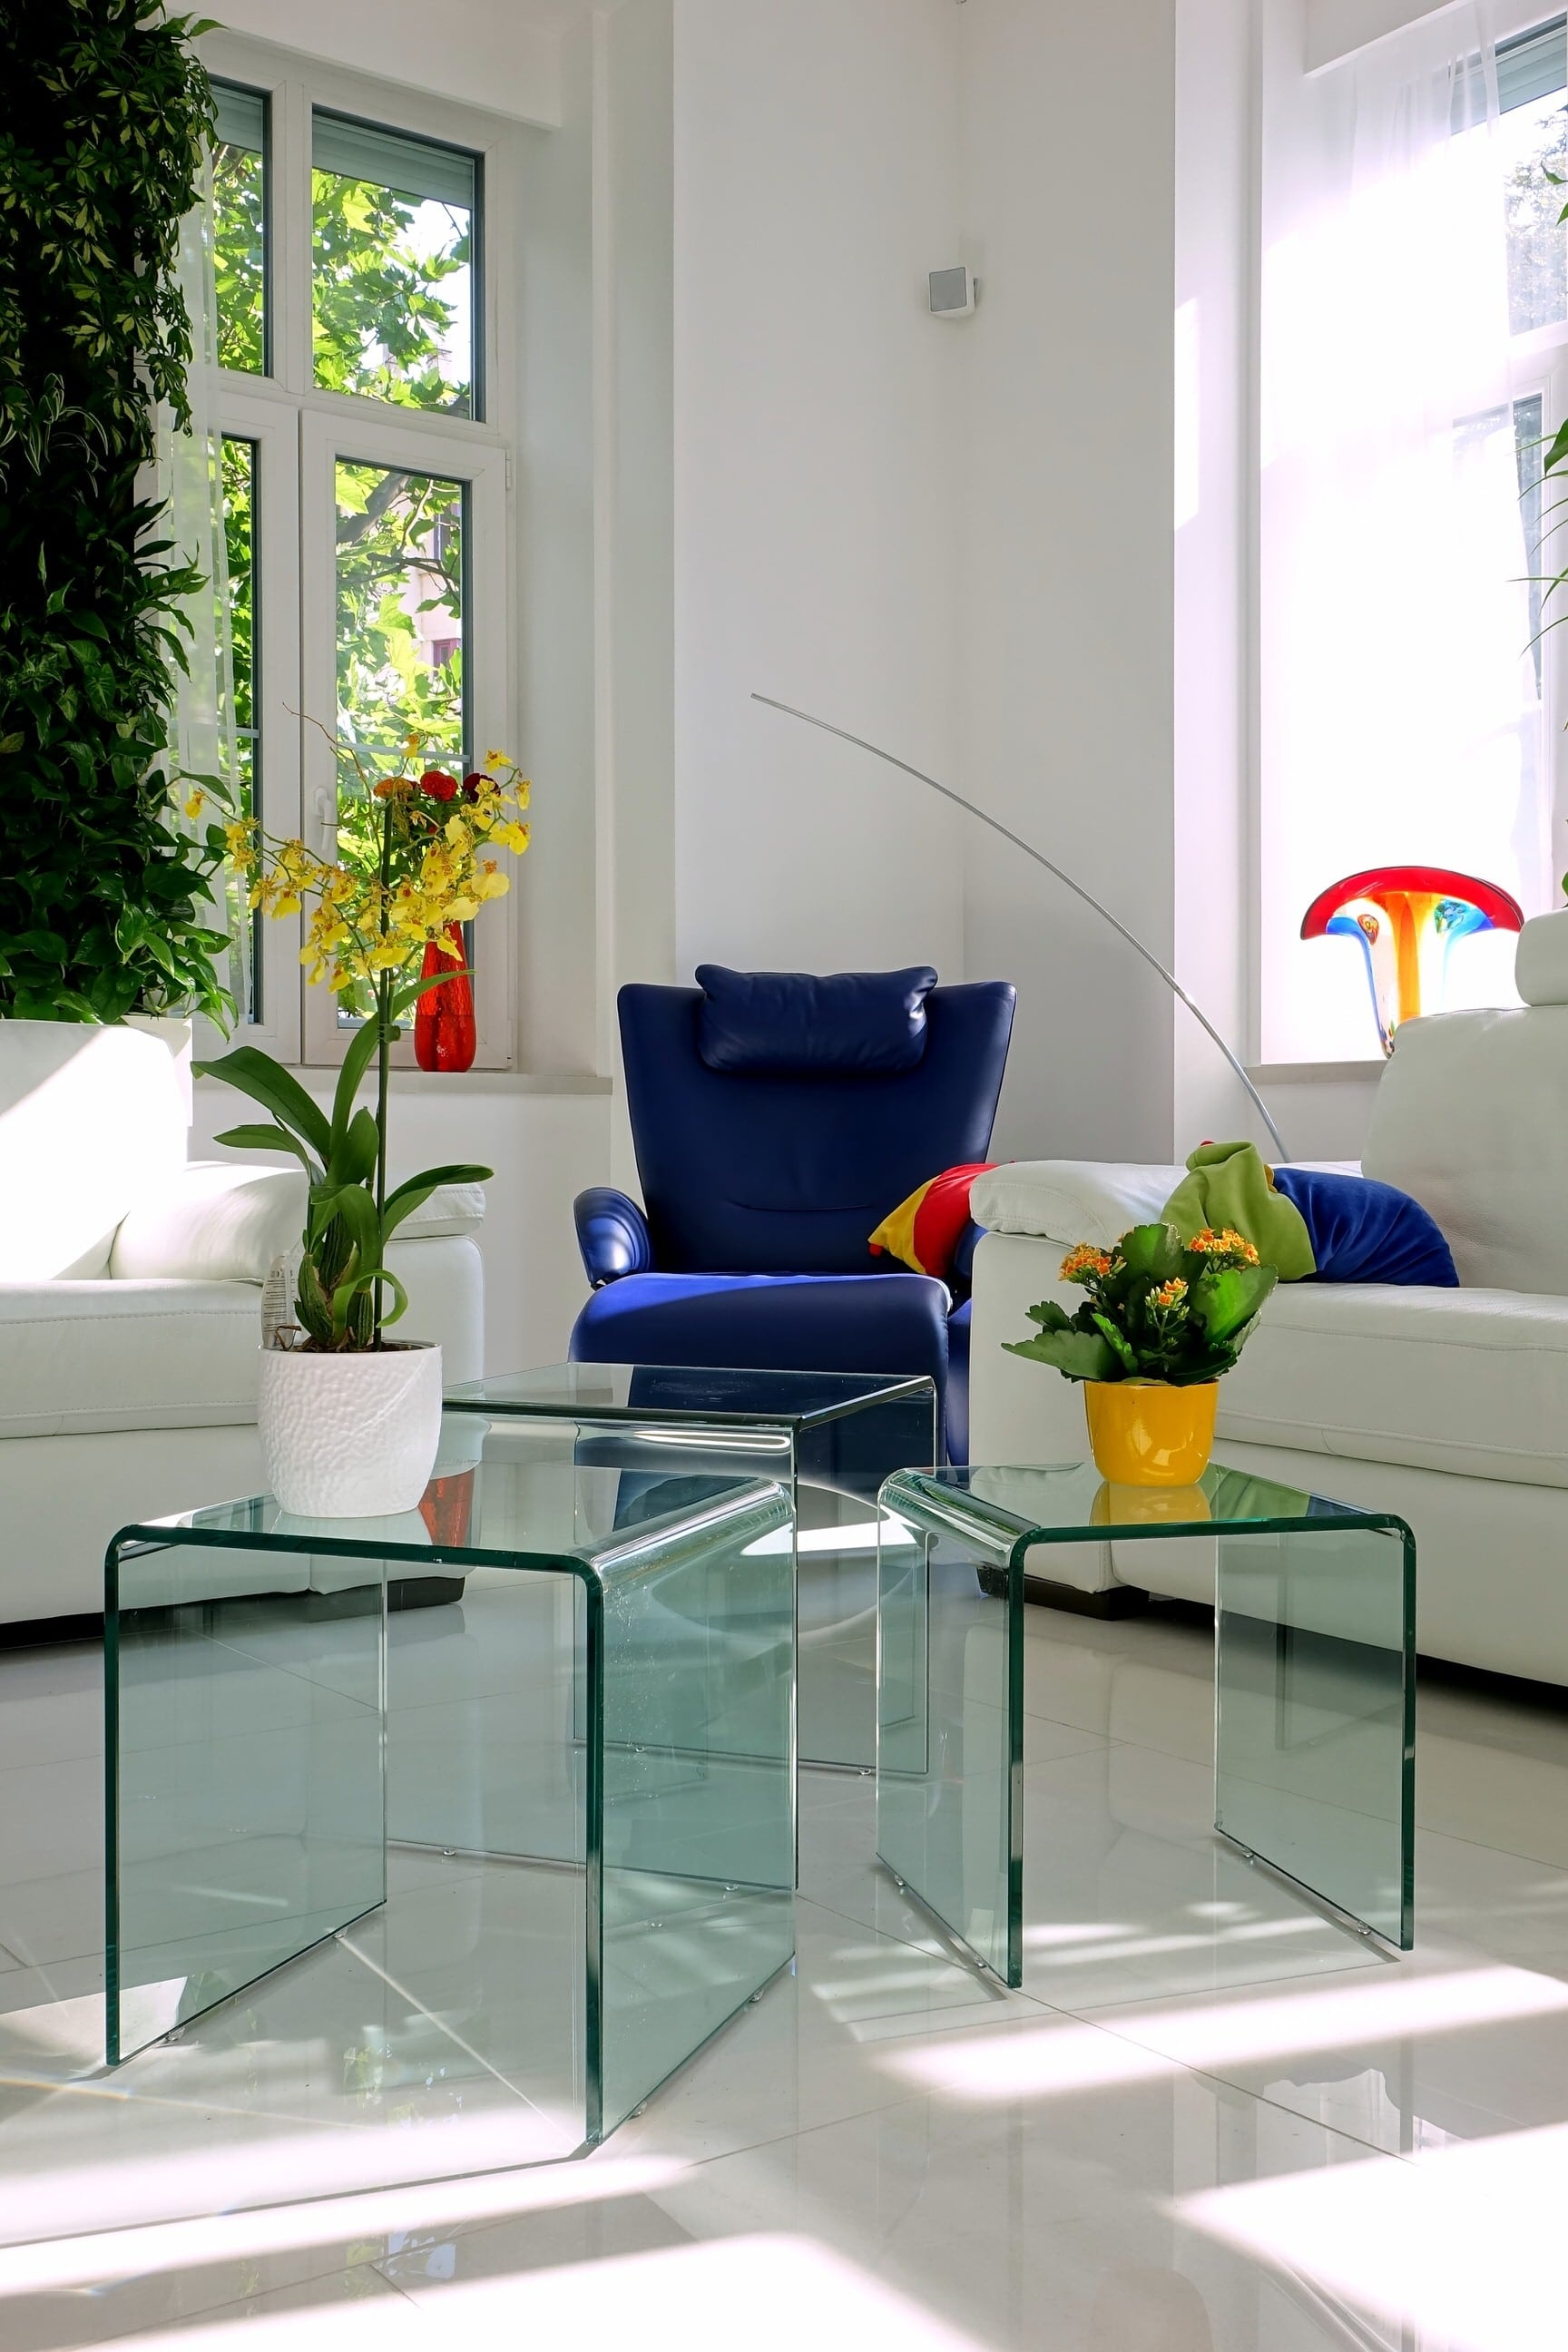 halasz-utca-modern-design-apartment-budapest-dsc00177_filtered